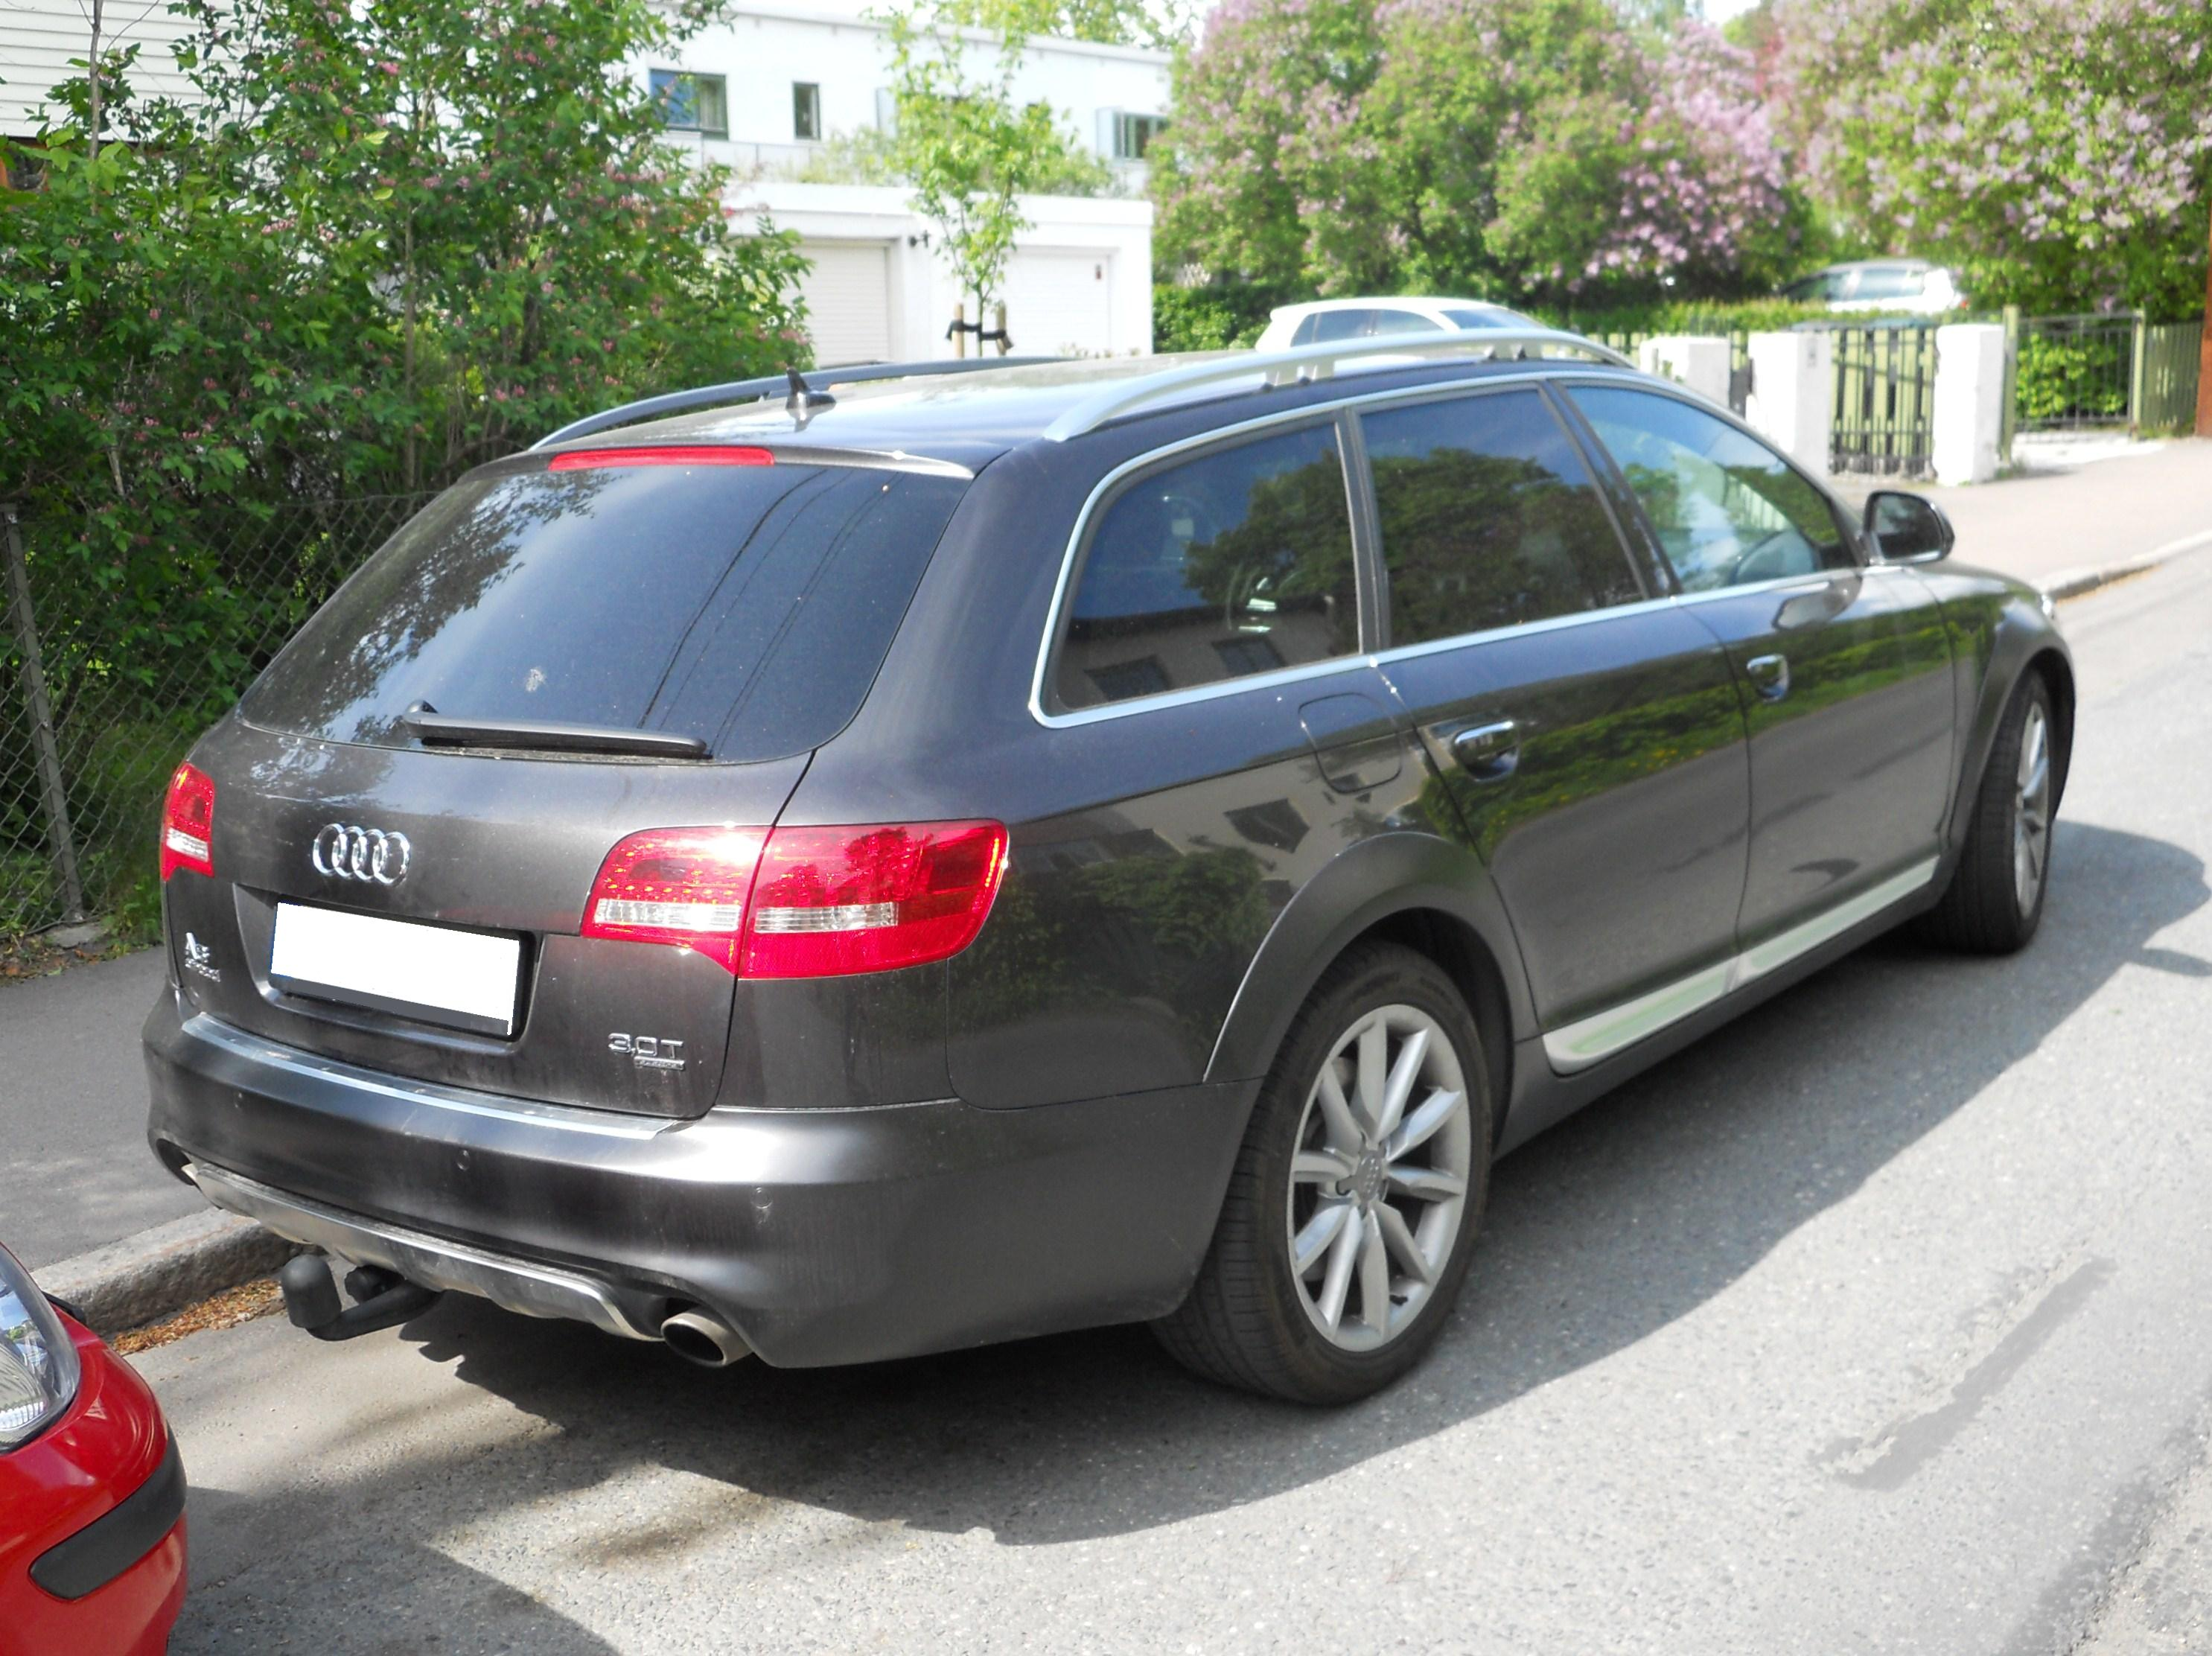 audi en t vehicle technical car allroad fuel specifications data